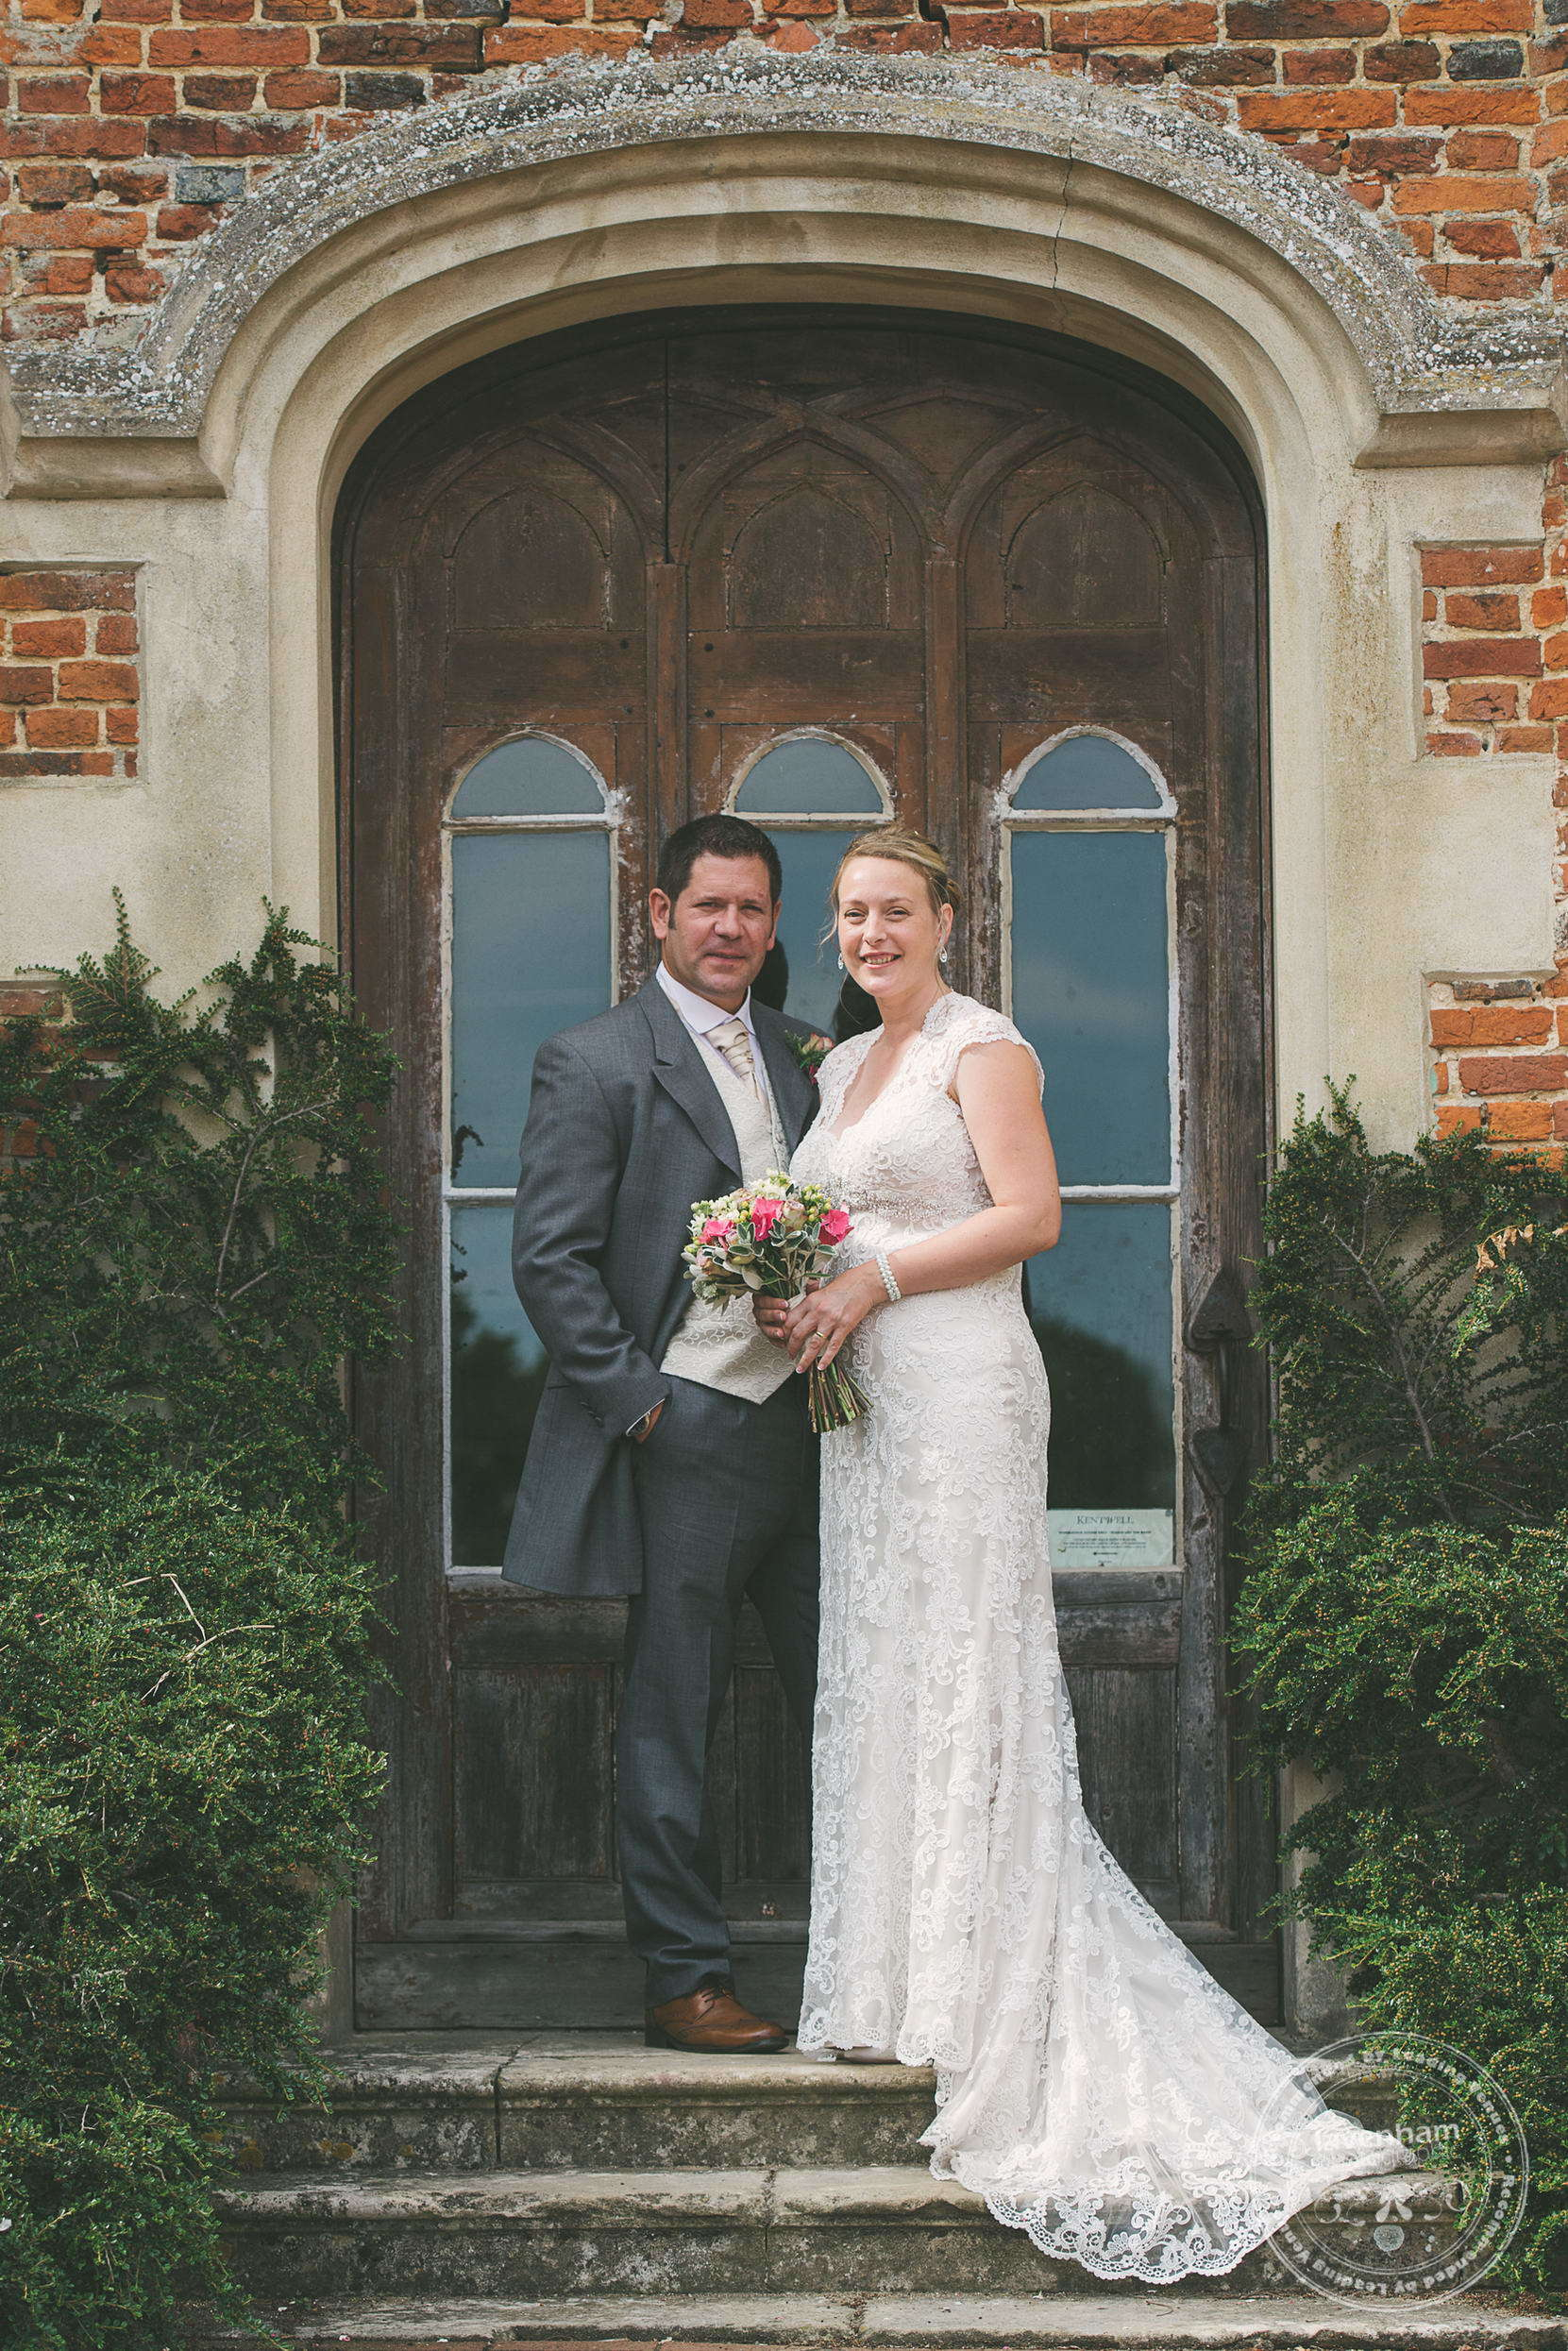 180715-kentwell-hall-wedding-photographer-017